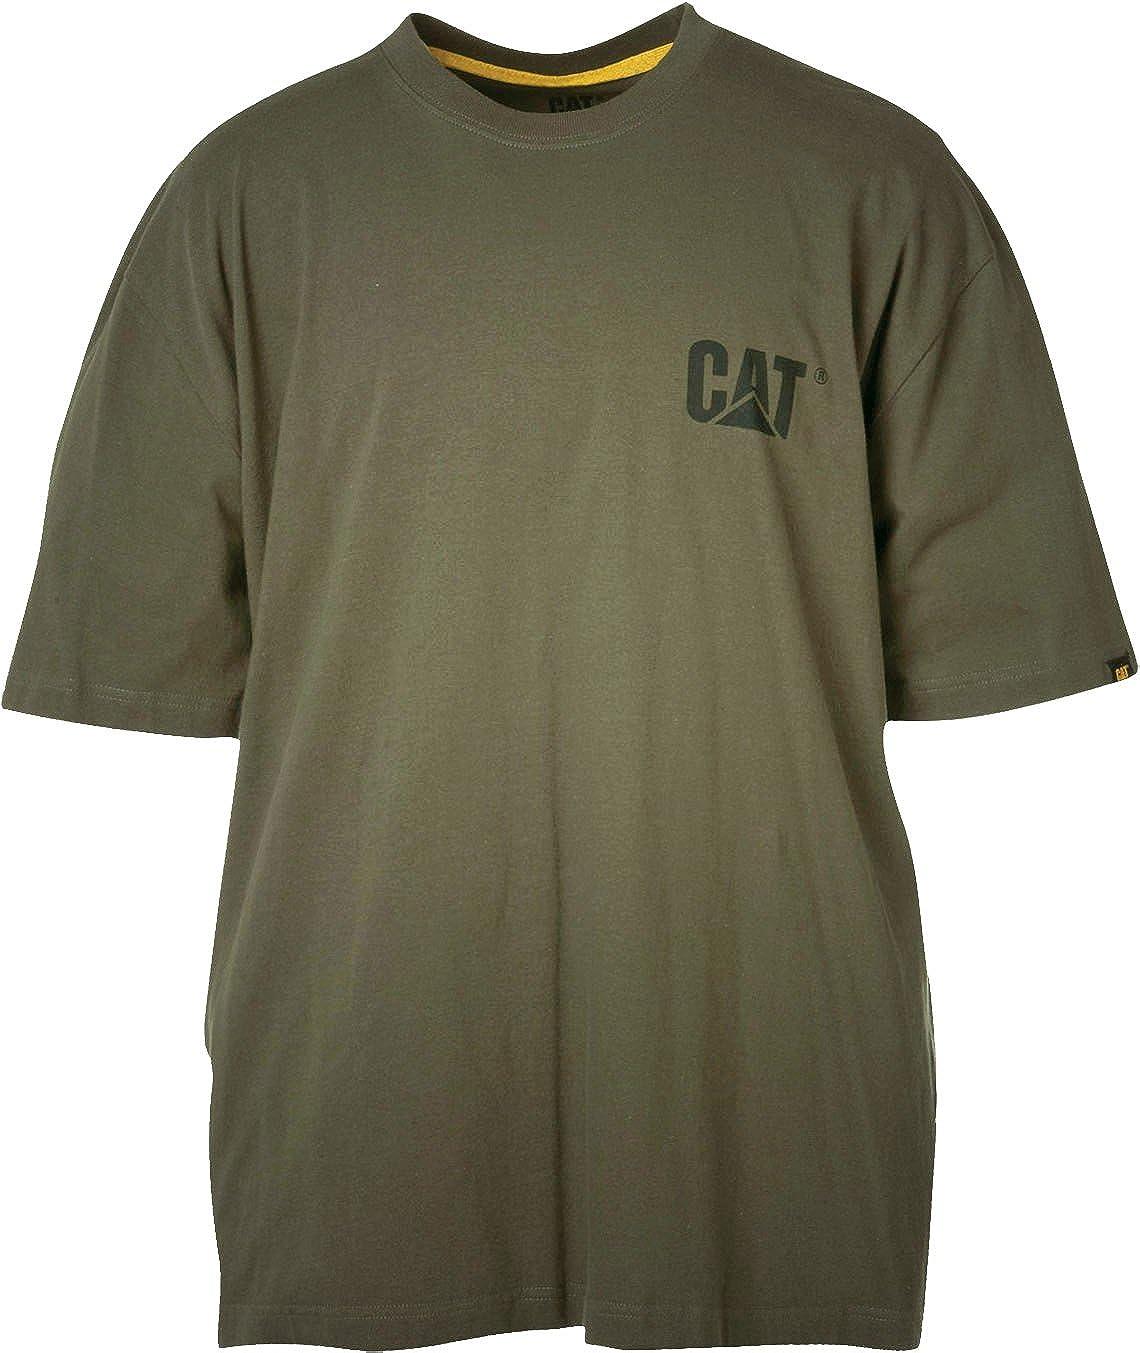 4eec1568f785 Amazon.com  Caterpillar Men s Trademark T-Shirt  Clothing